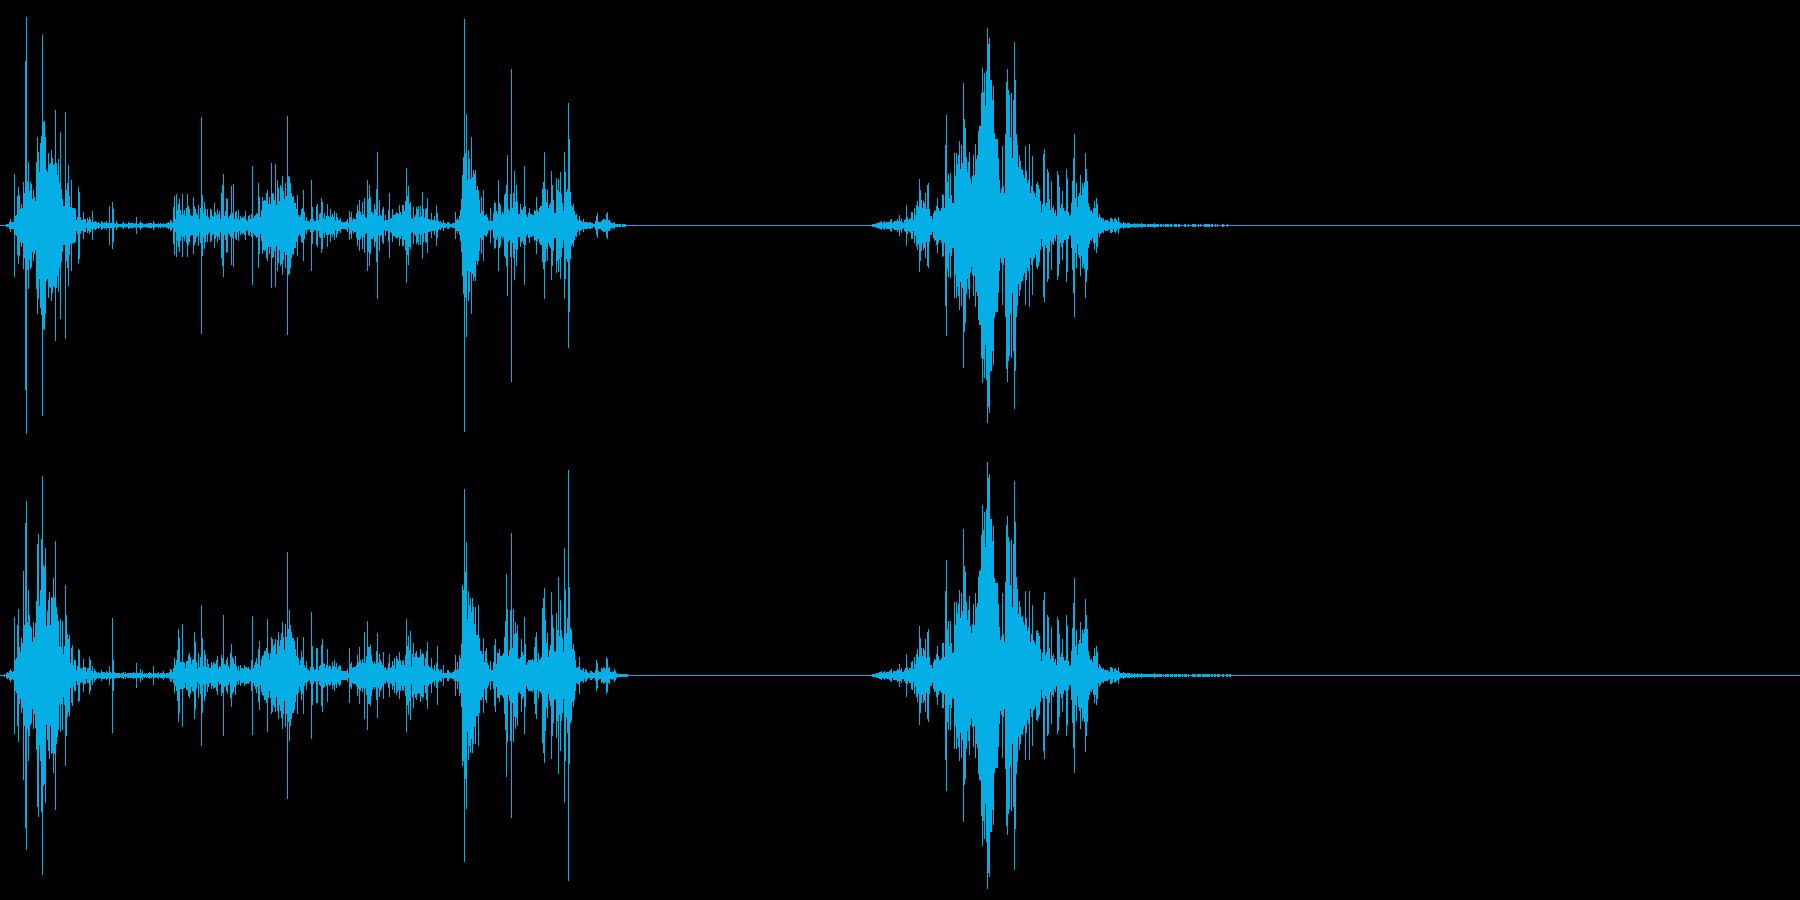 Gore Splatters X2の再生済みの波形